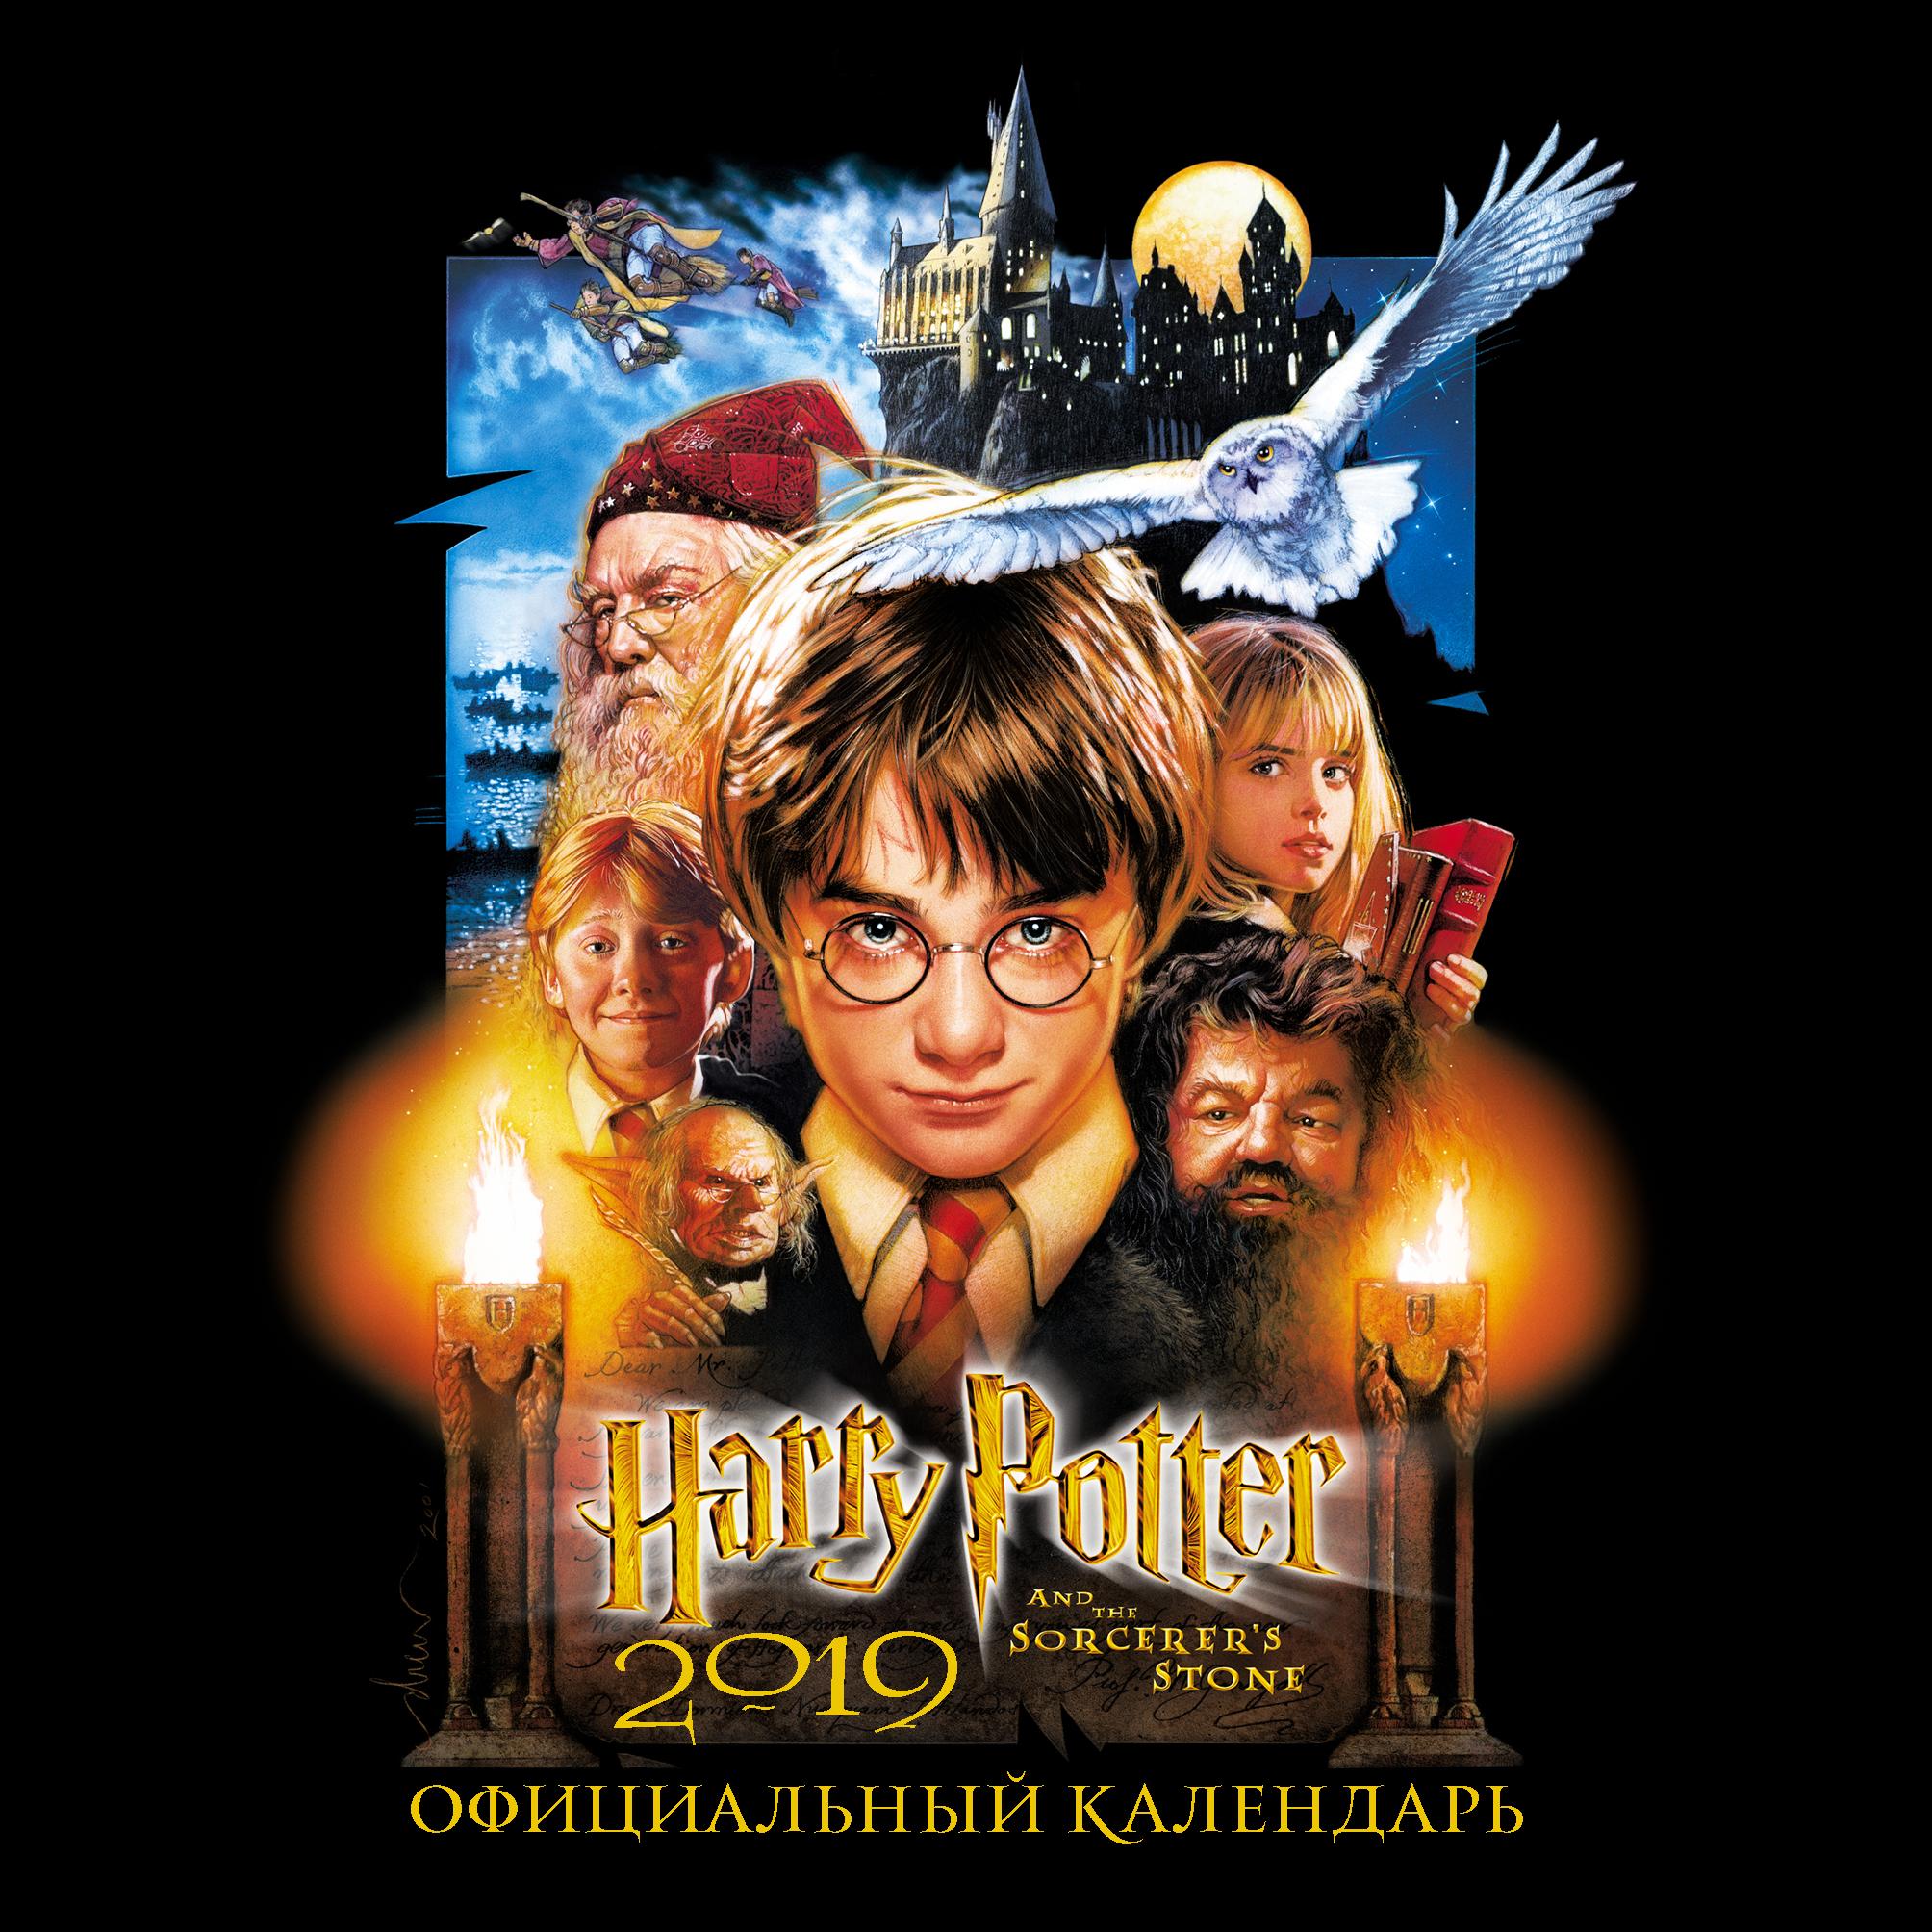 Гарри Поттер. Календарь настенный на 2019 год (170х170 мм) ISBN: 978-5-04-095263-2